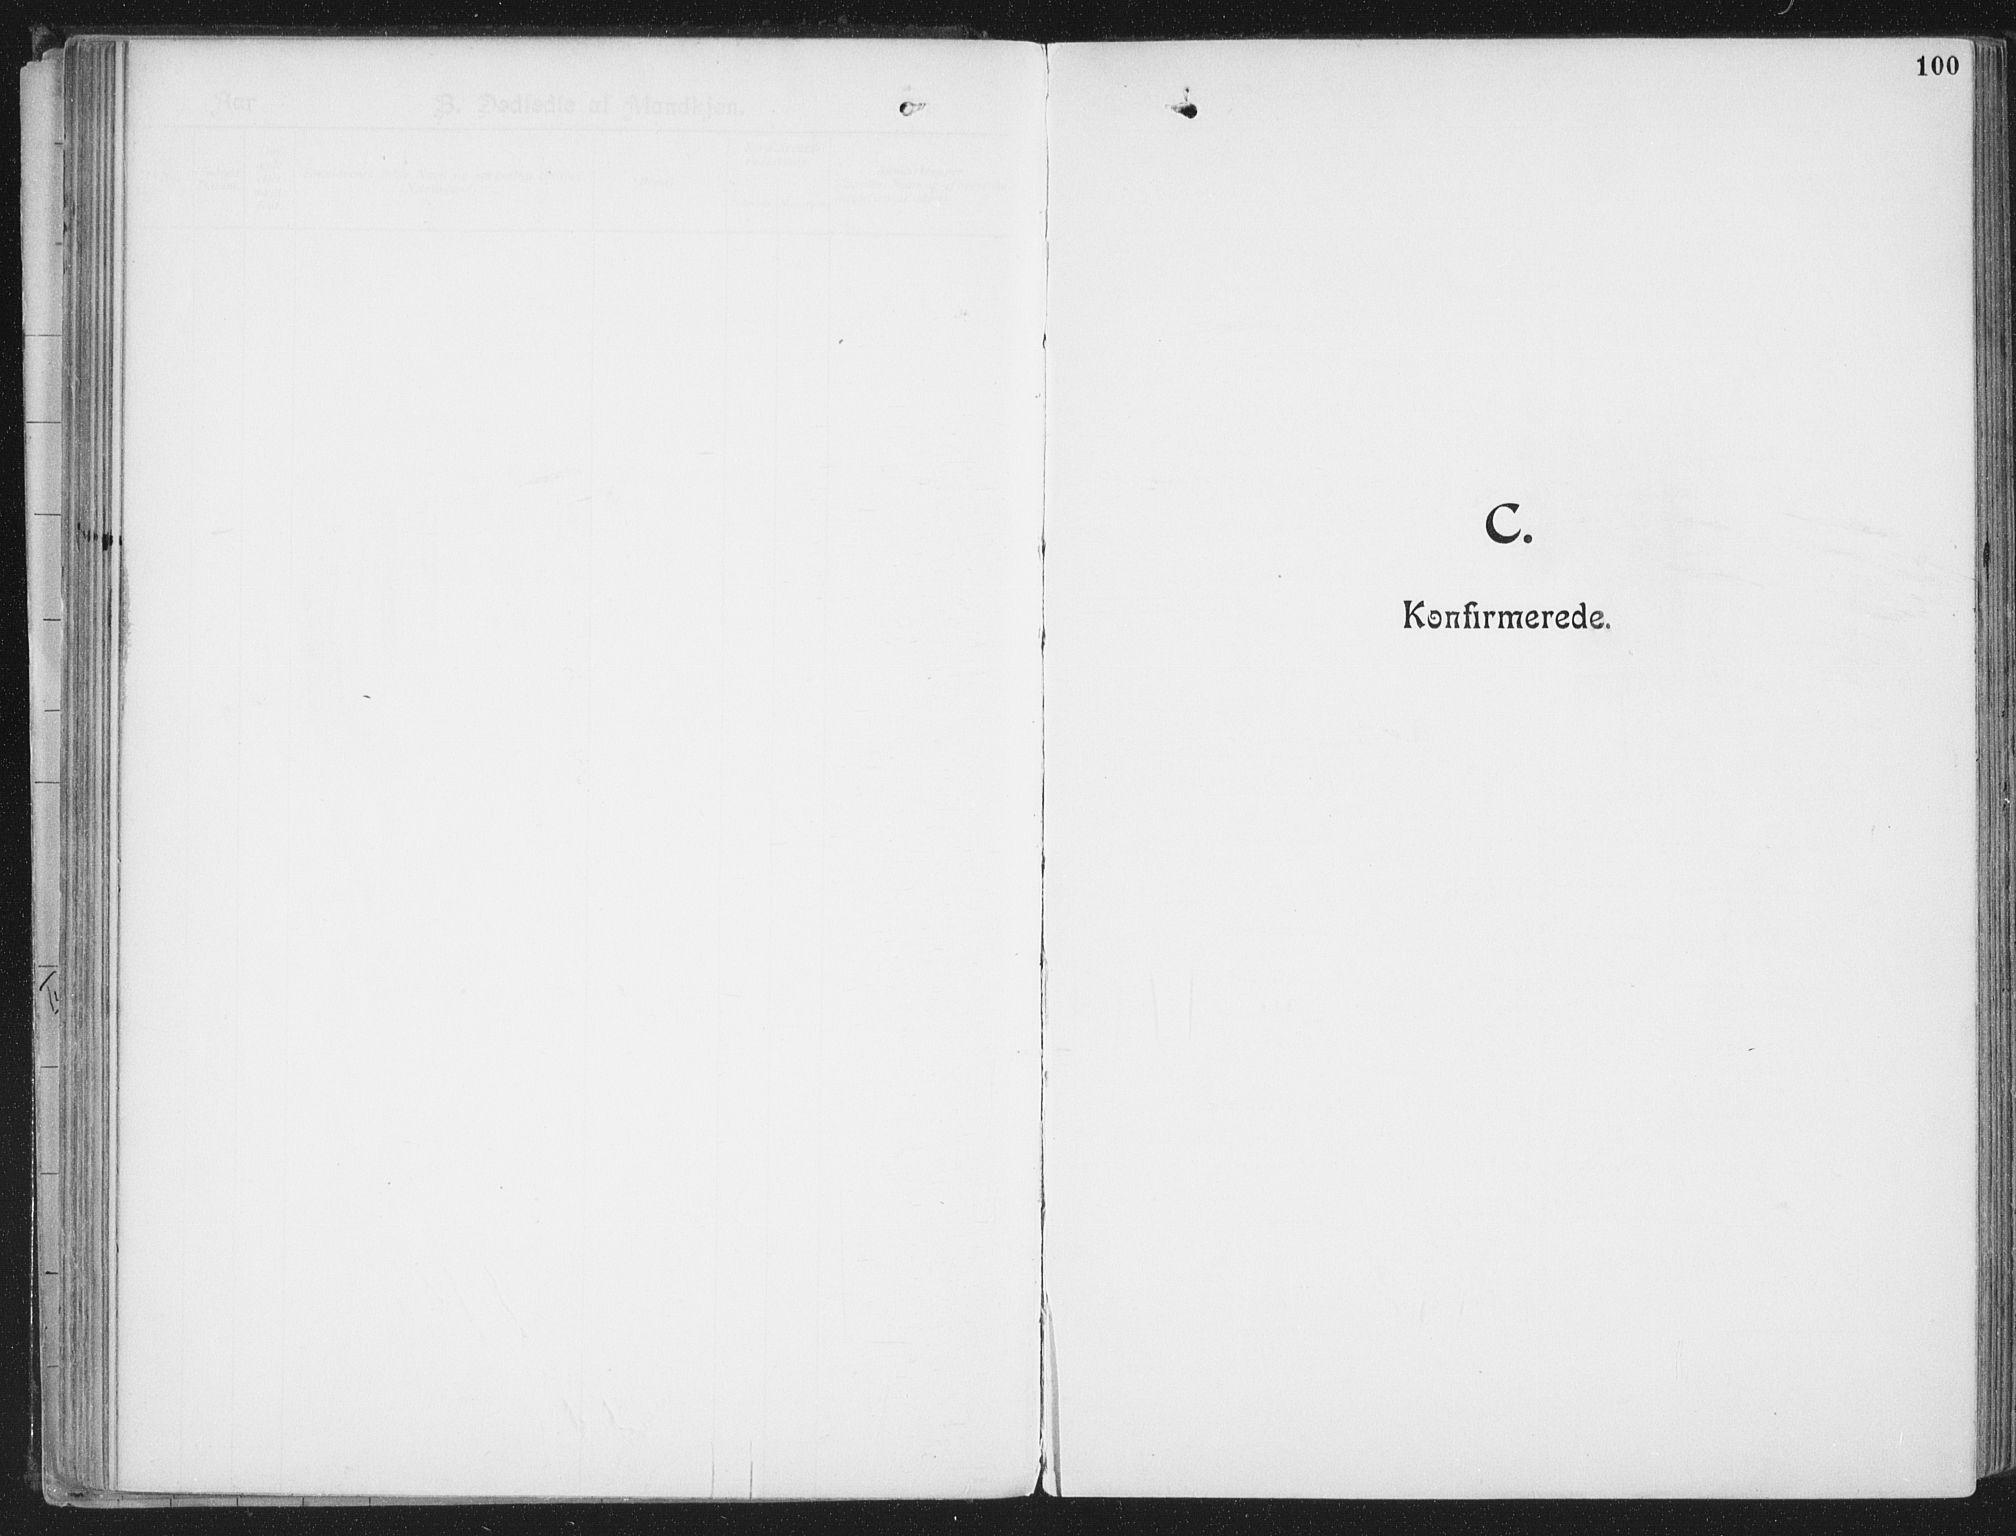 SAT, Ministerialprotokoller, klokkerbøker og fødselsregistre - Nordland, 804/L0081: Ministerialbok nr. 804A02, 1901-1915, s. 100